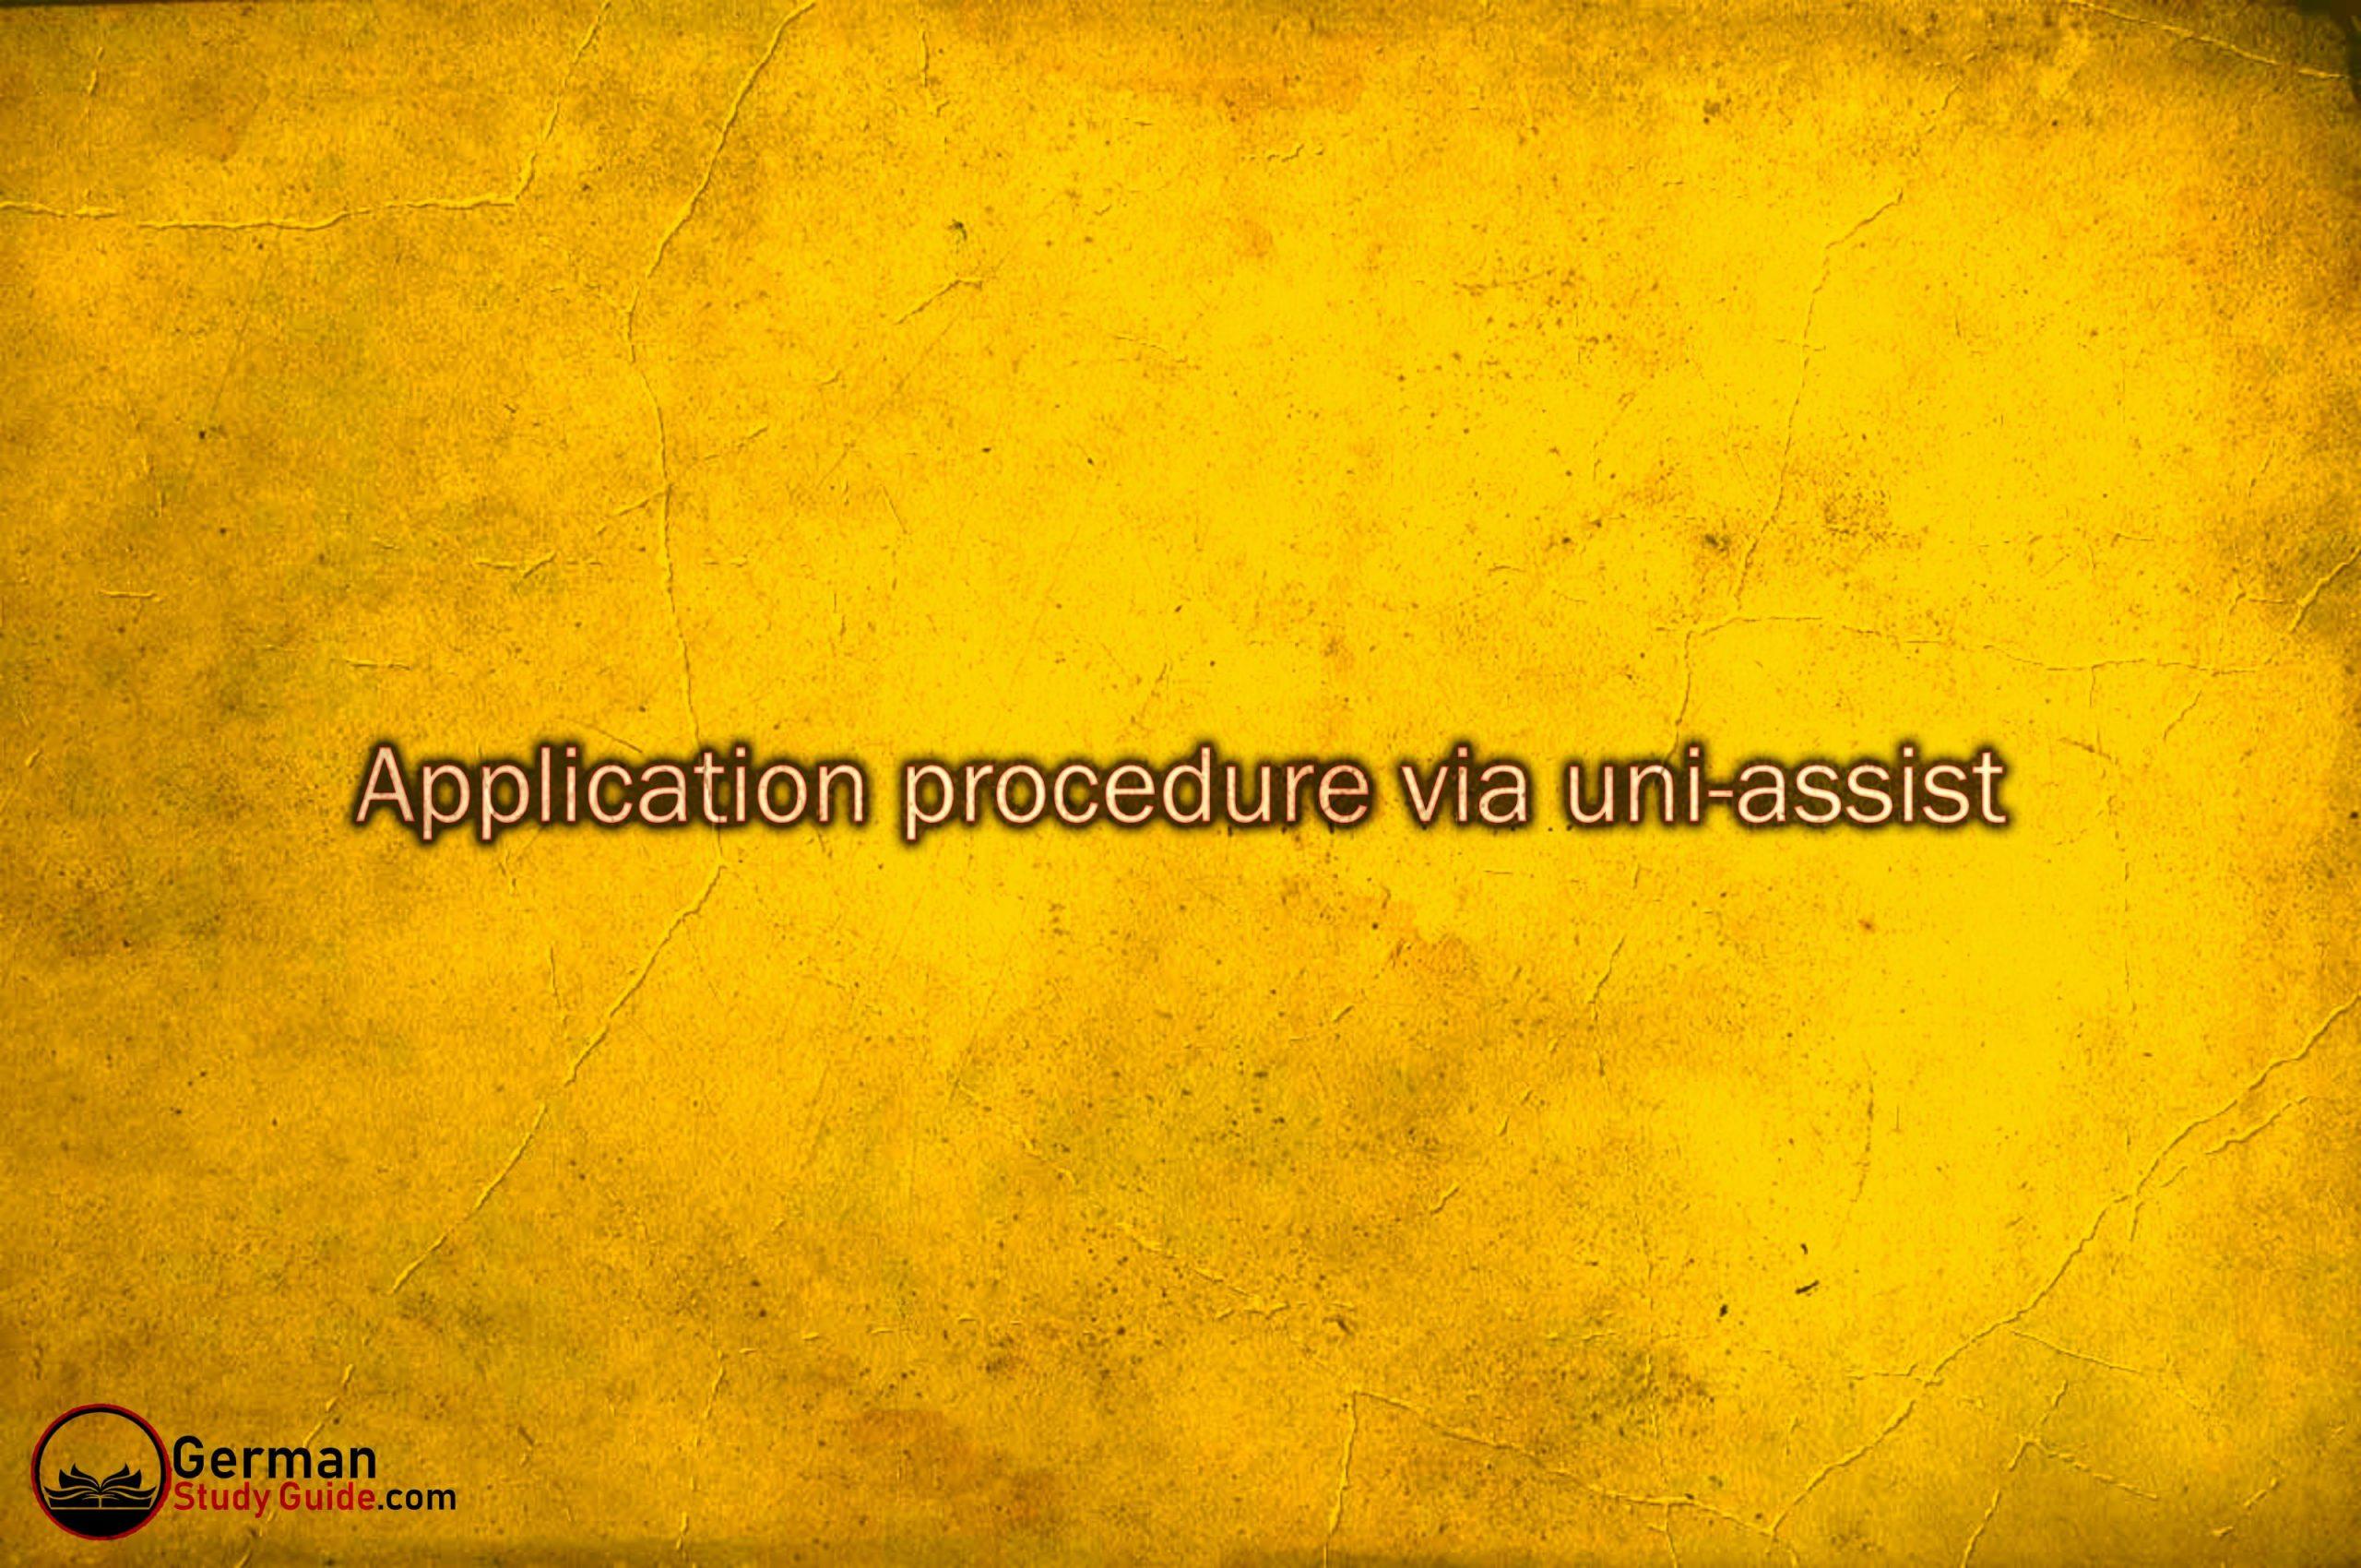 Application procedure via uni-assist